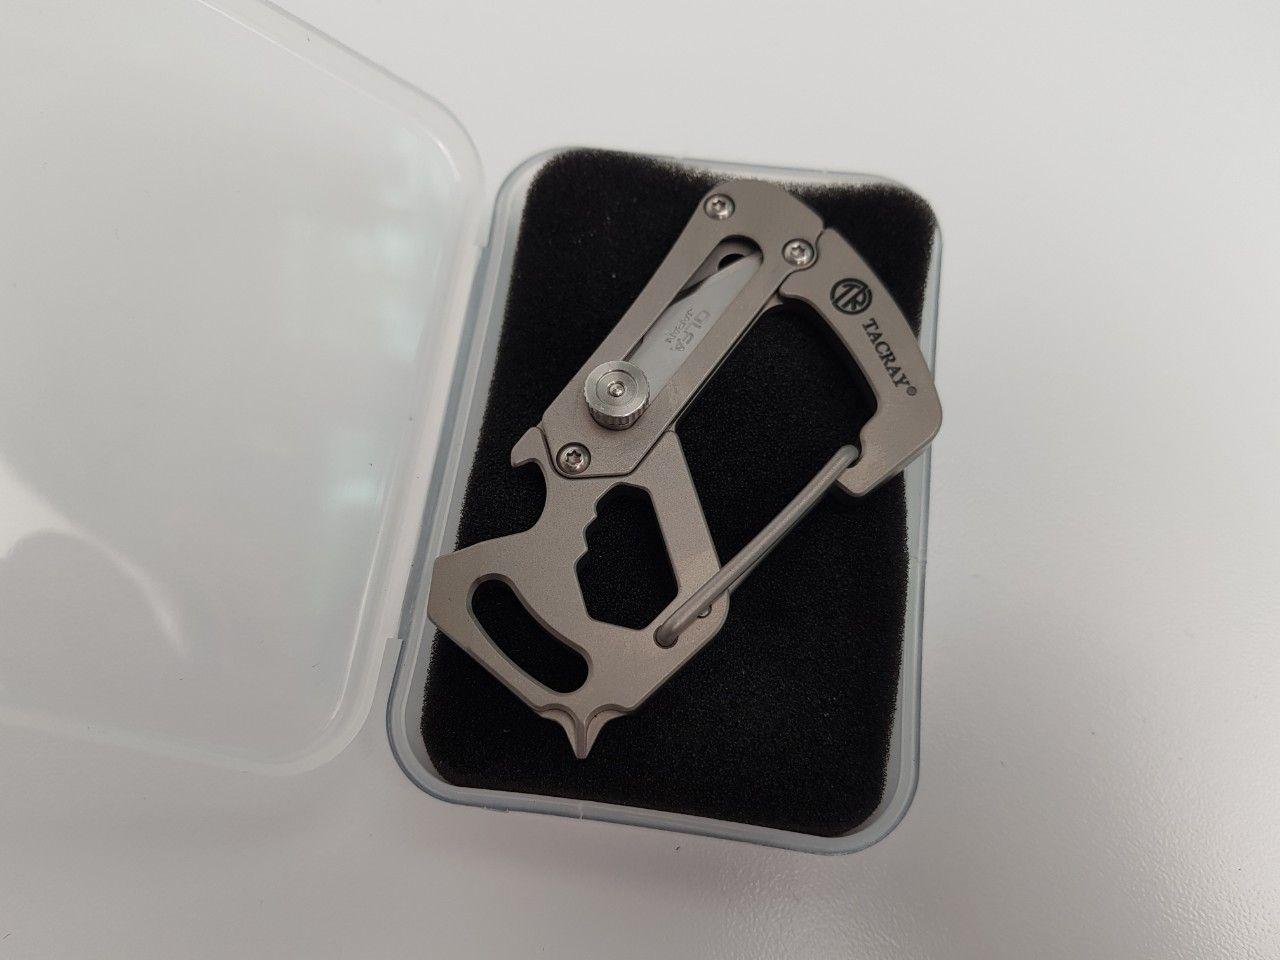 TACRAY - Carabiner INCH Titanium kèm dao rọc giấy (YSK1801) Bản mới